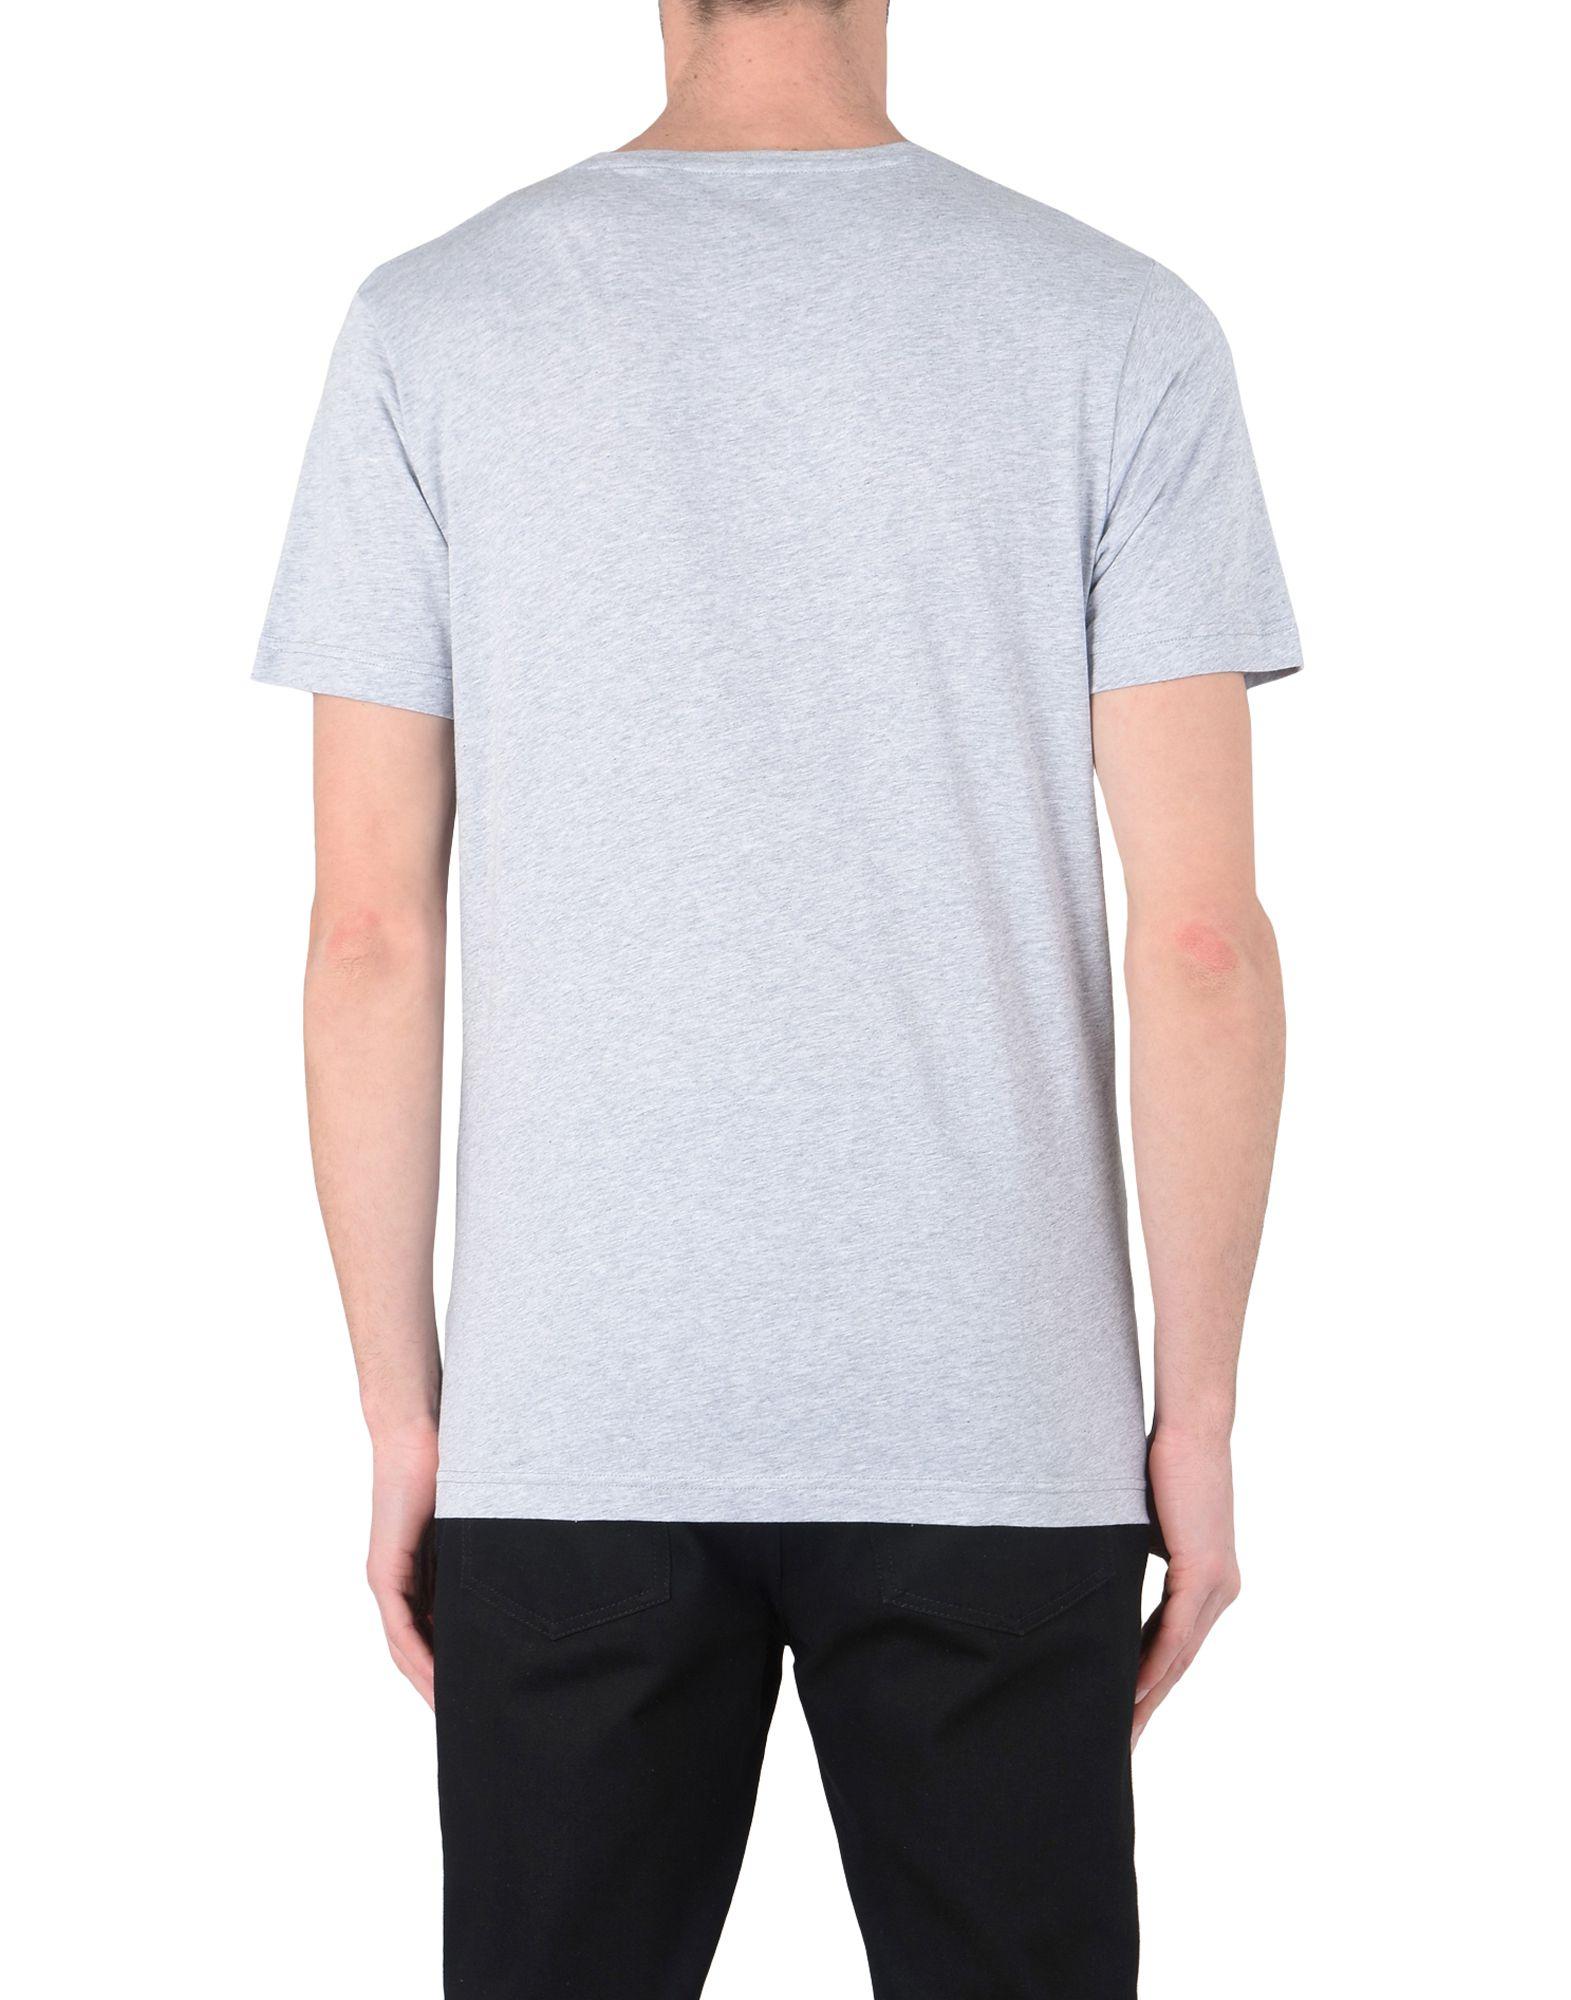 T-Shirt Makia Makia T-Shirt Do Or Die T-Shirt - Uomo - 12167434OE b0c277